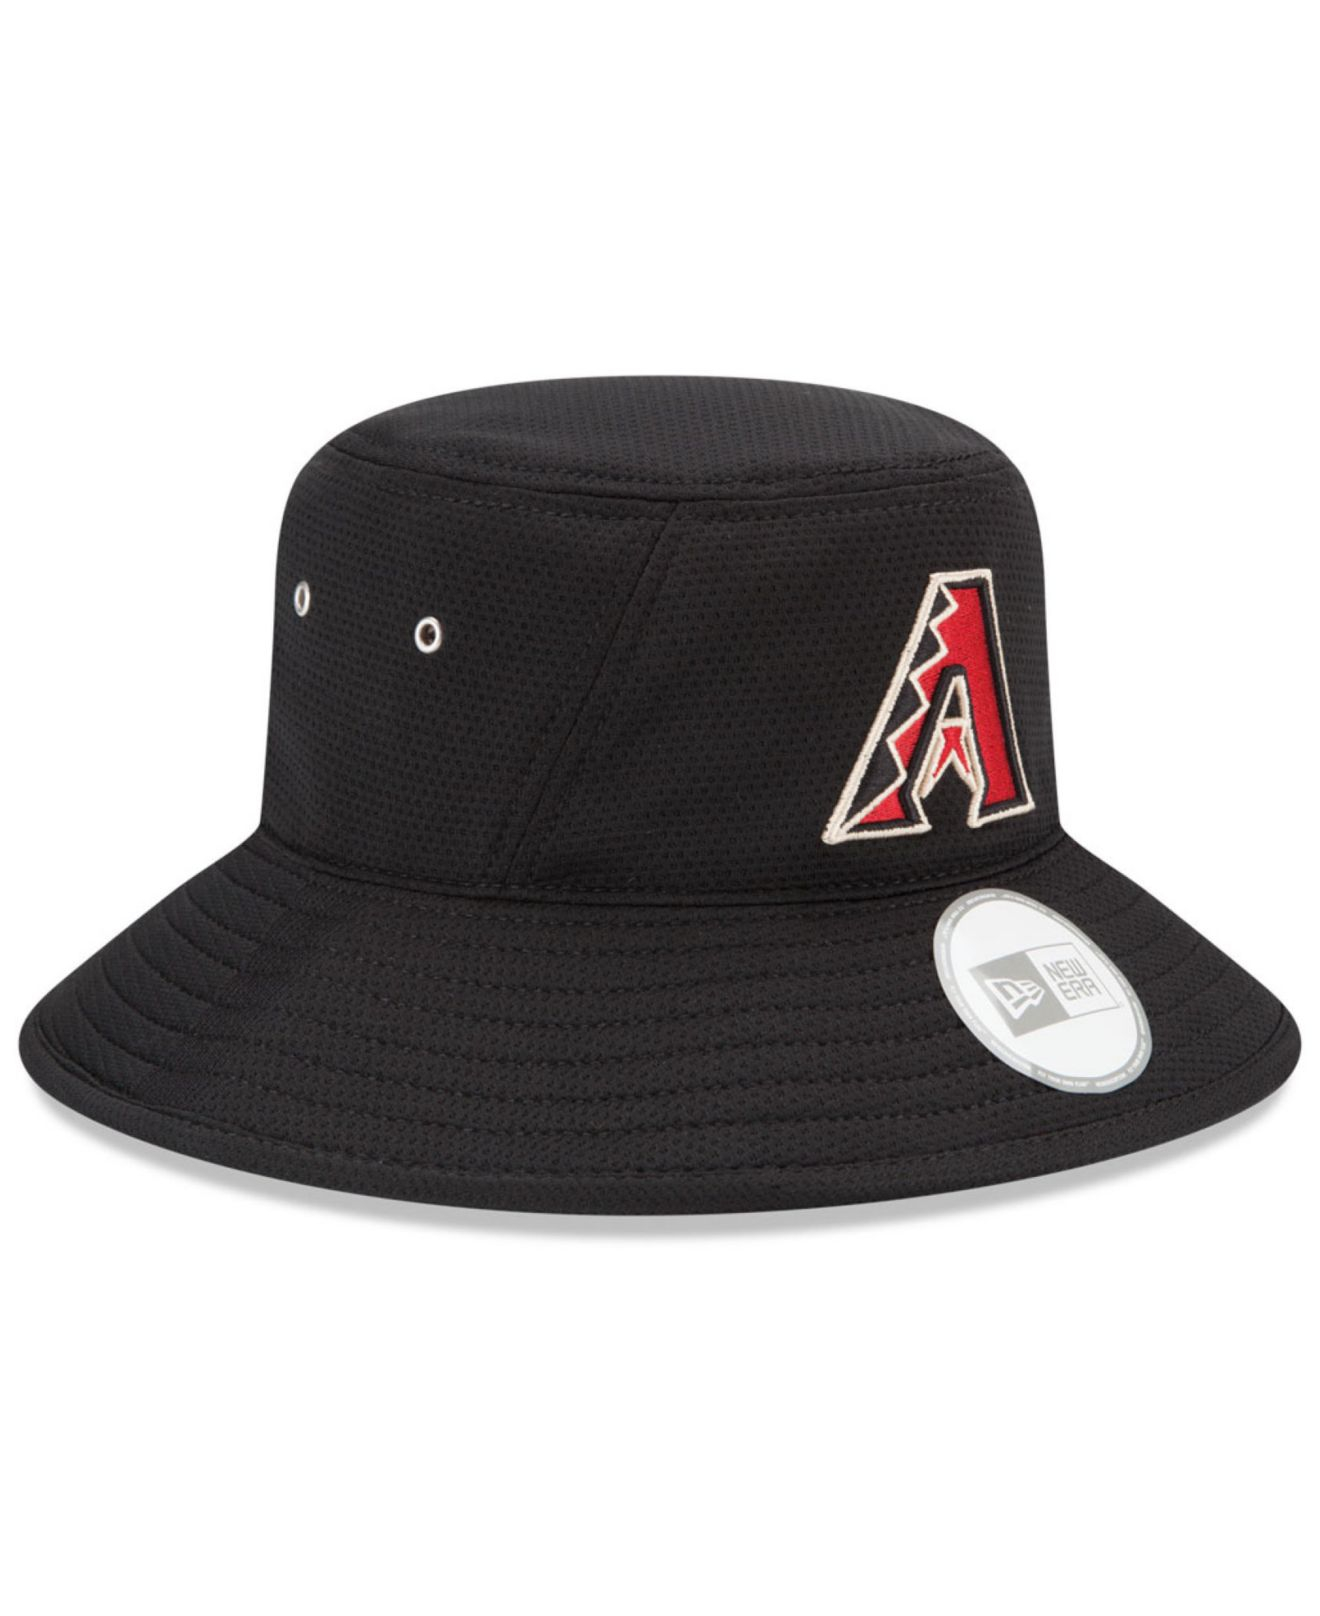 8fdeb09e659 ... sale lyst ktz arizona diamondbacks team redux bucket hat in black for  men ef88b 5fc03